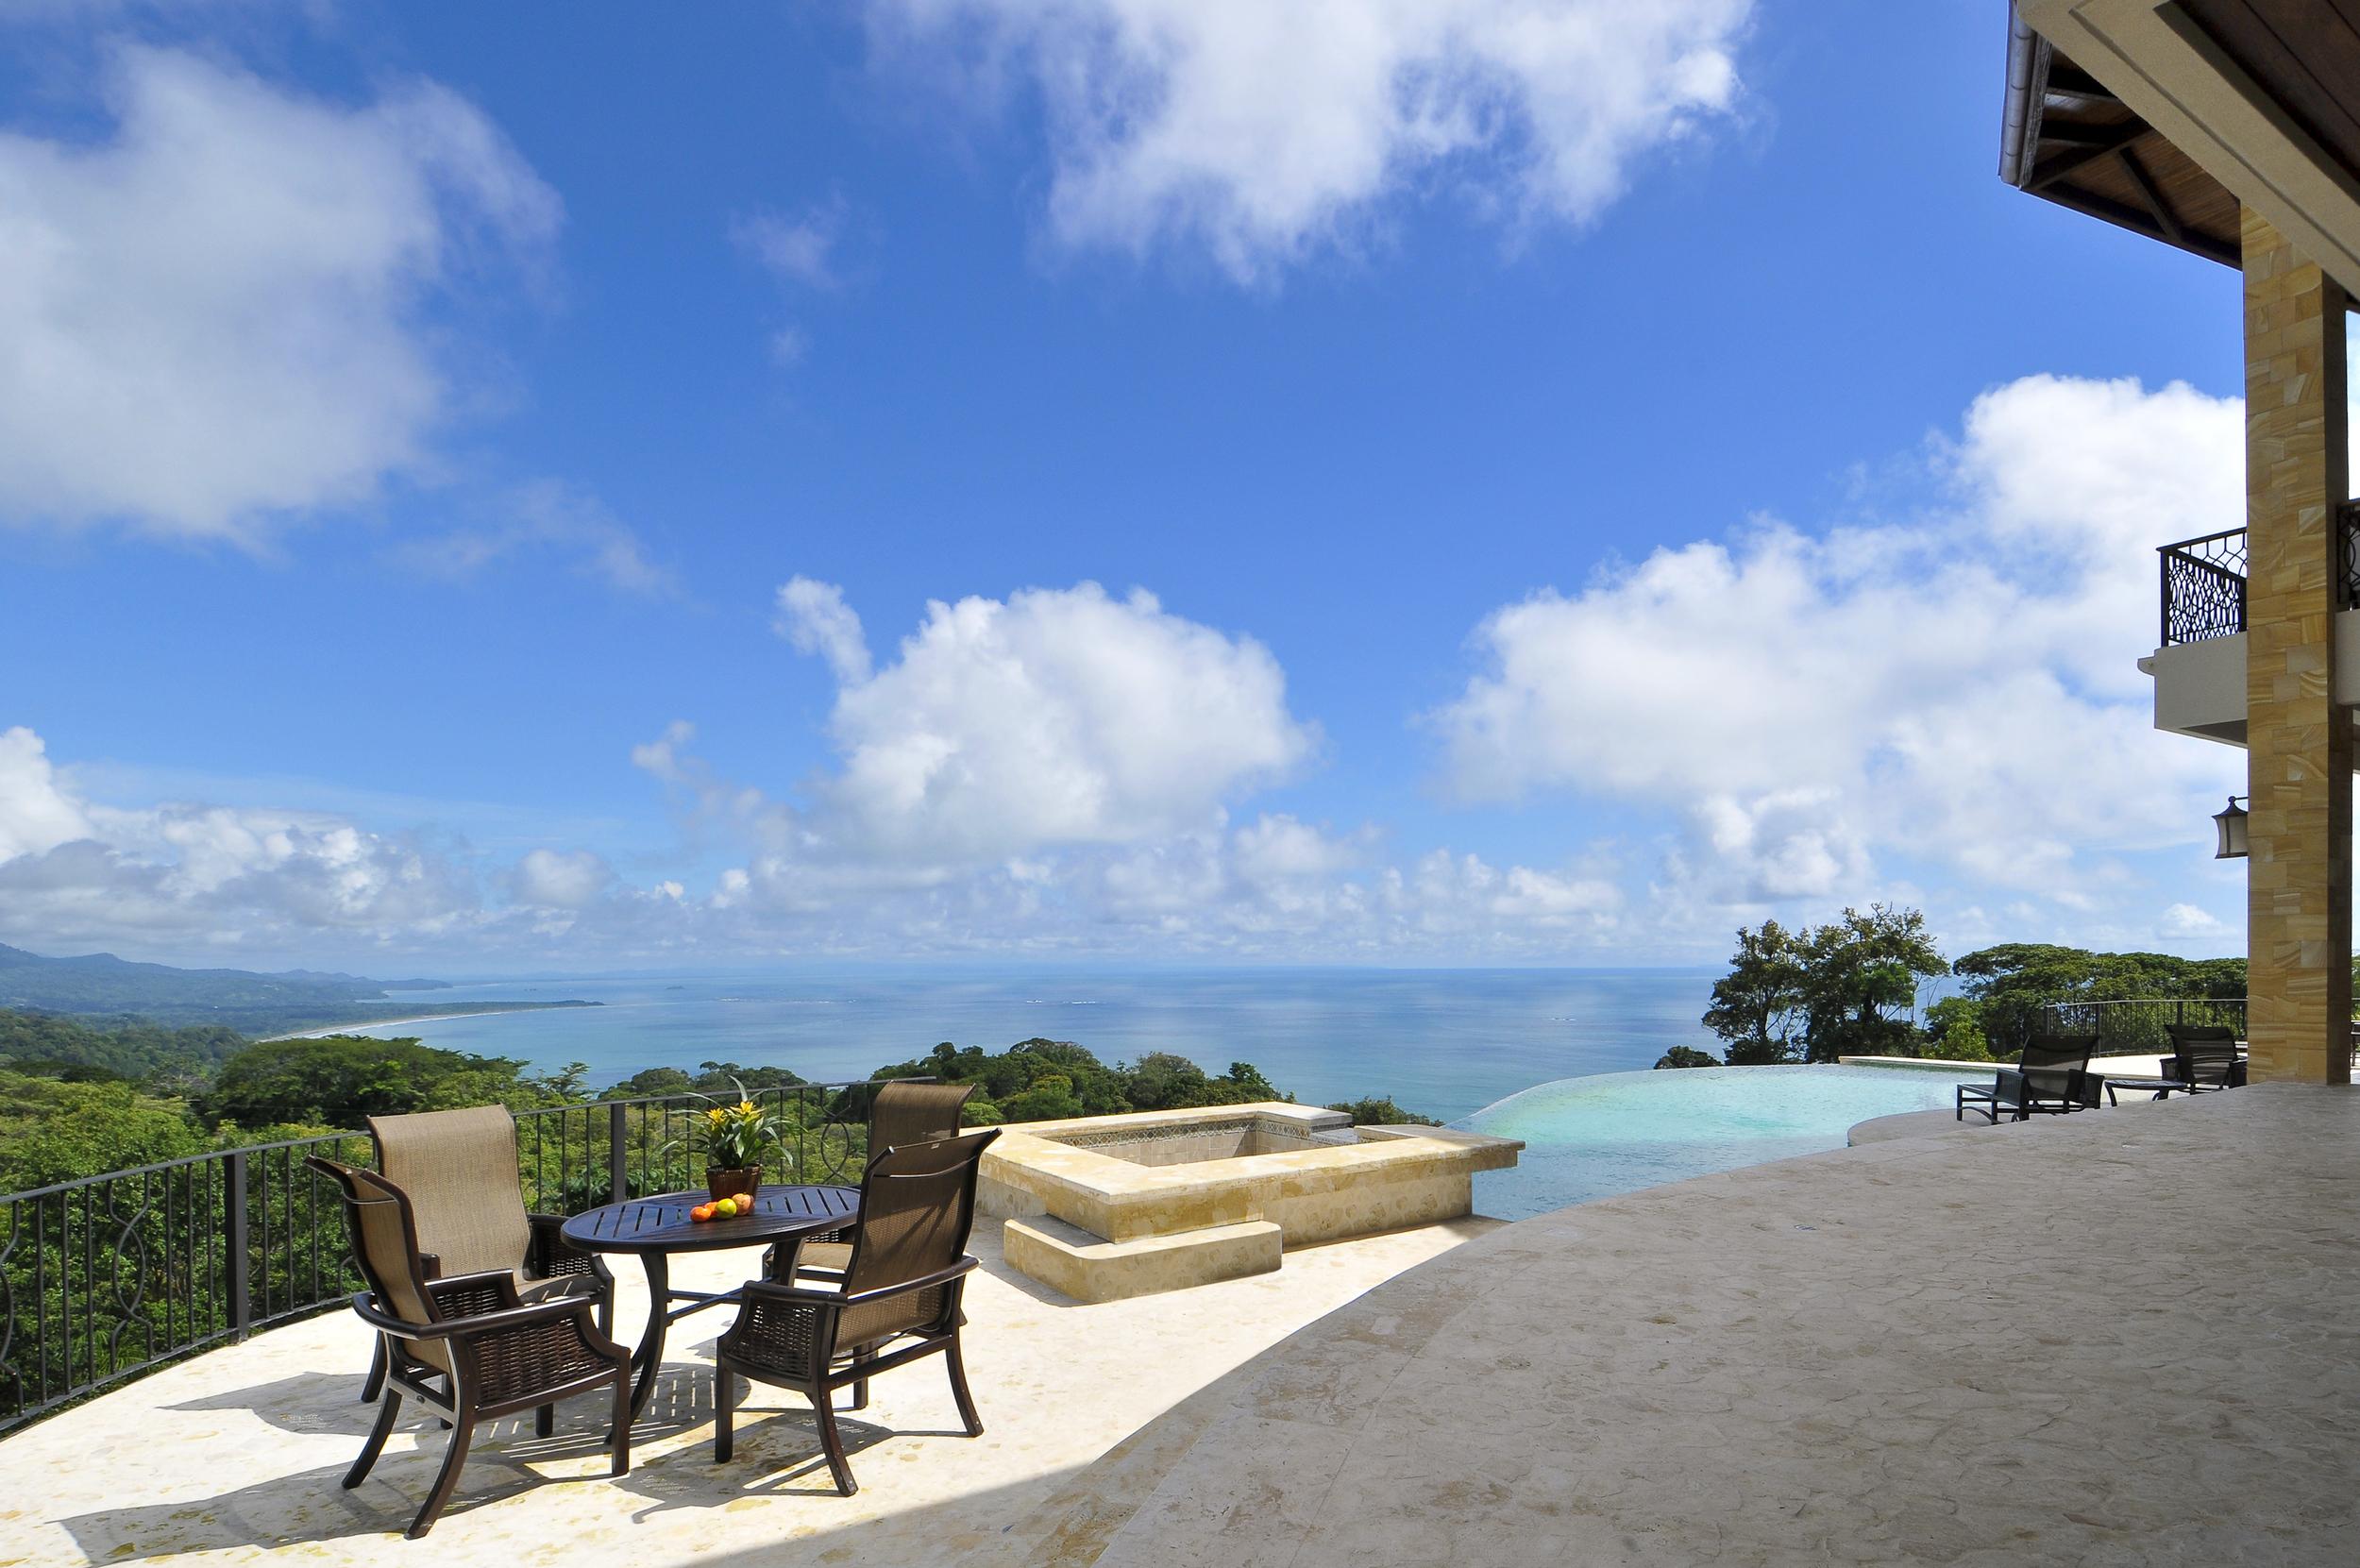 flex5-yoga-retreat-costa-rica-villa-gym-infinity-pool-ocean-view.jpg